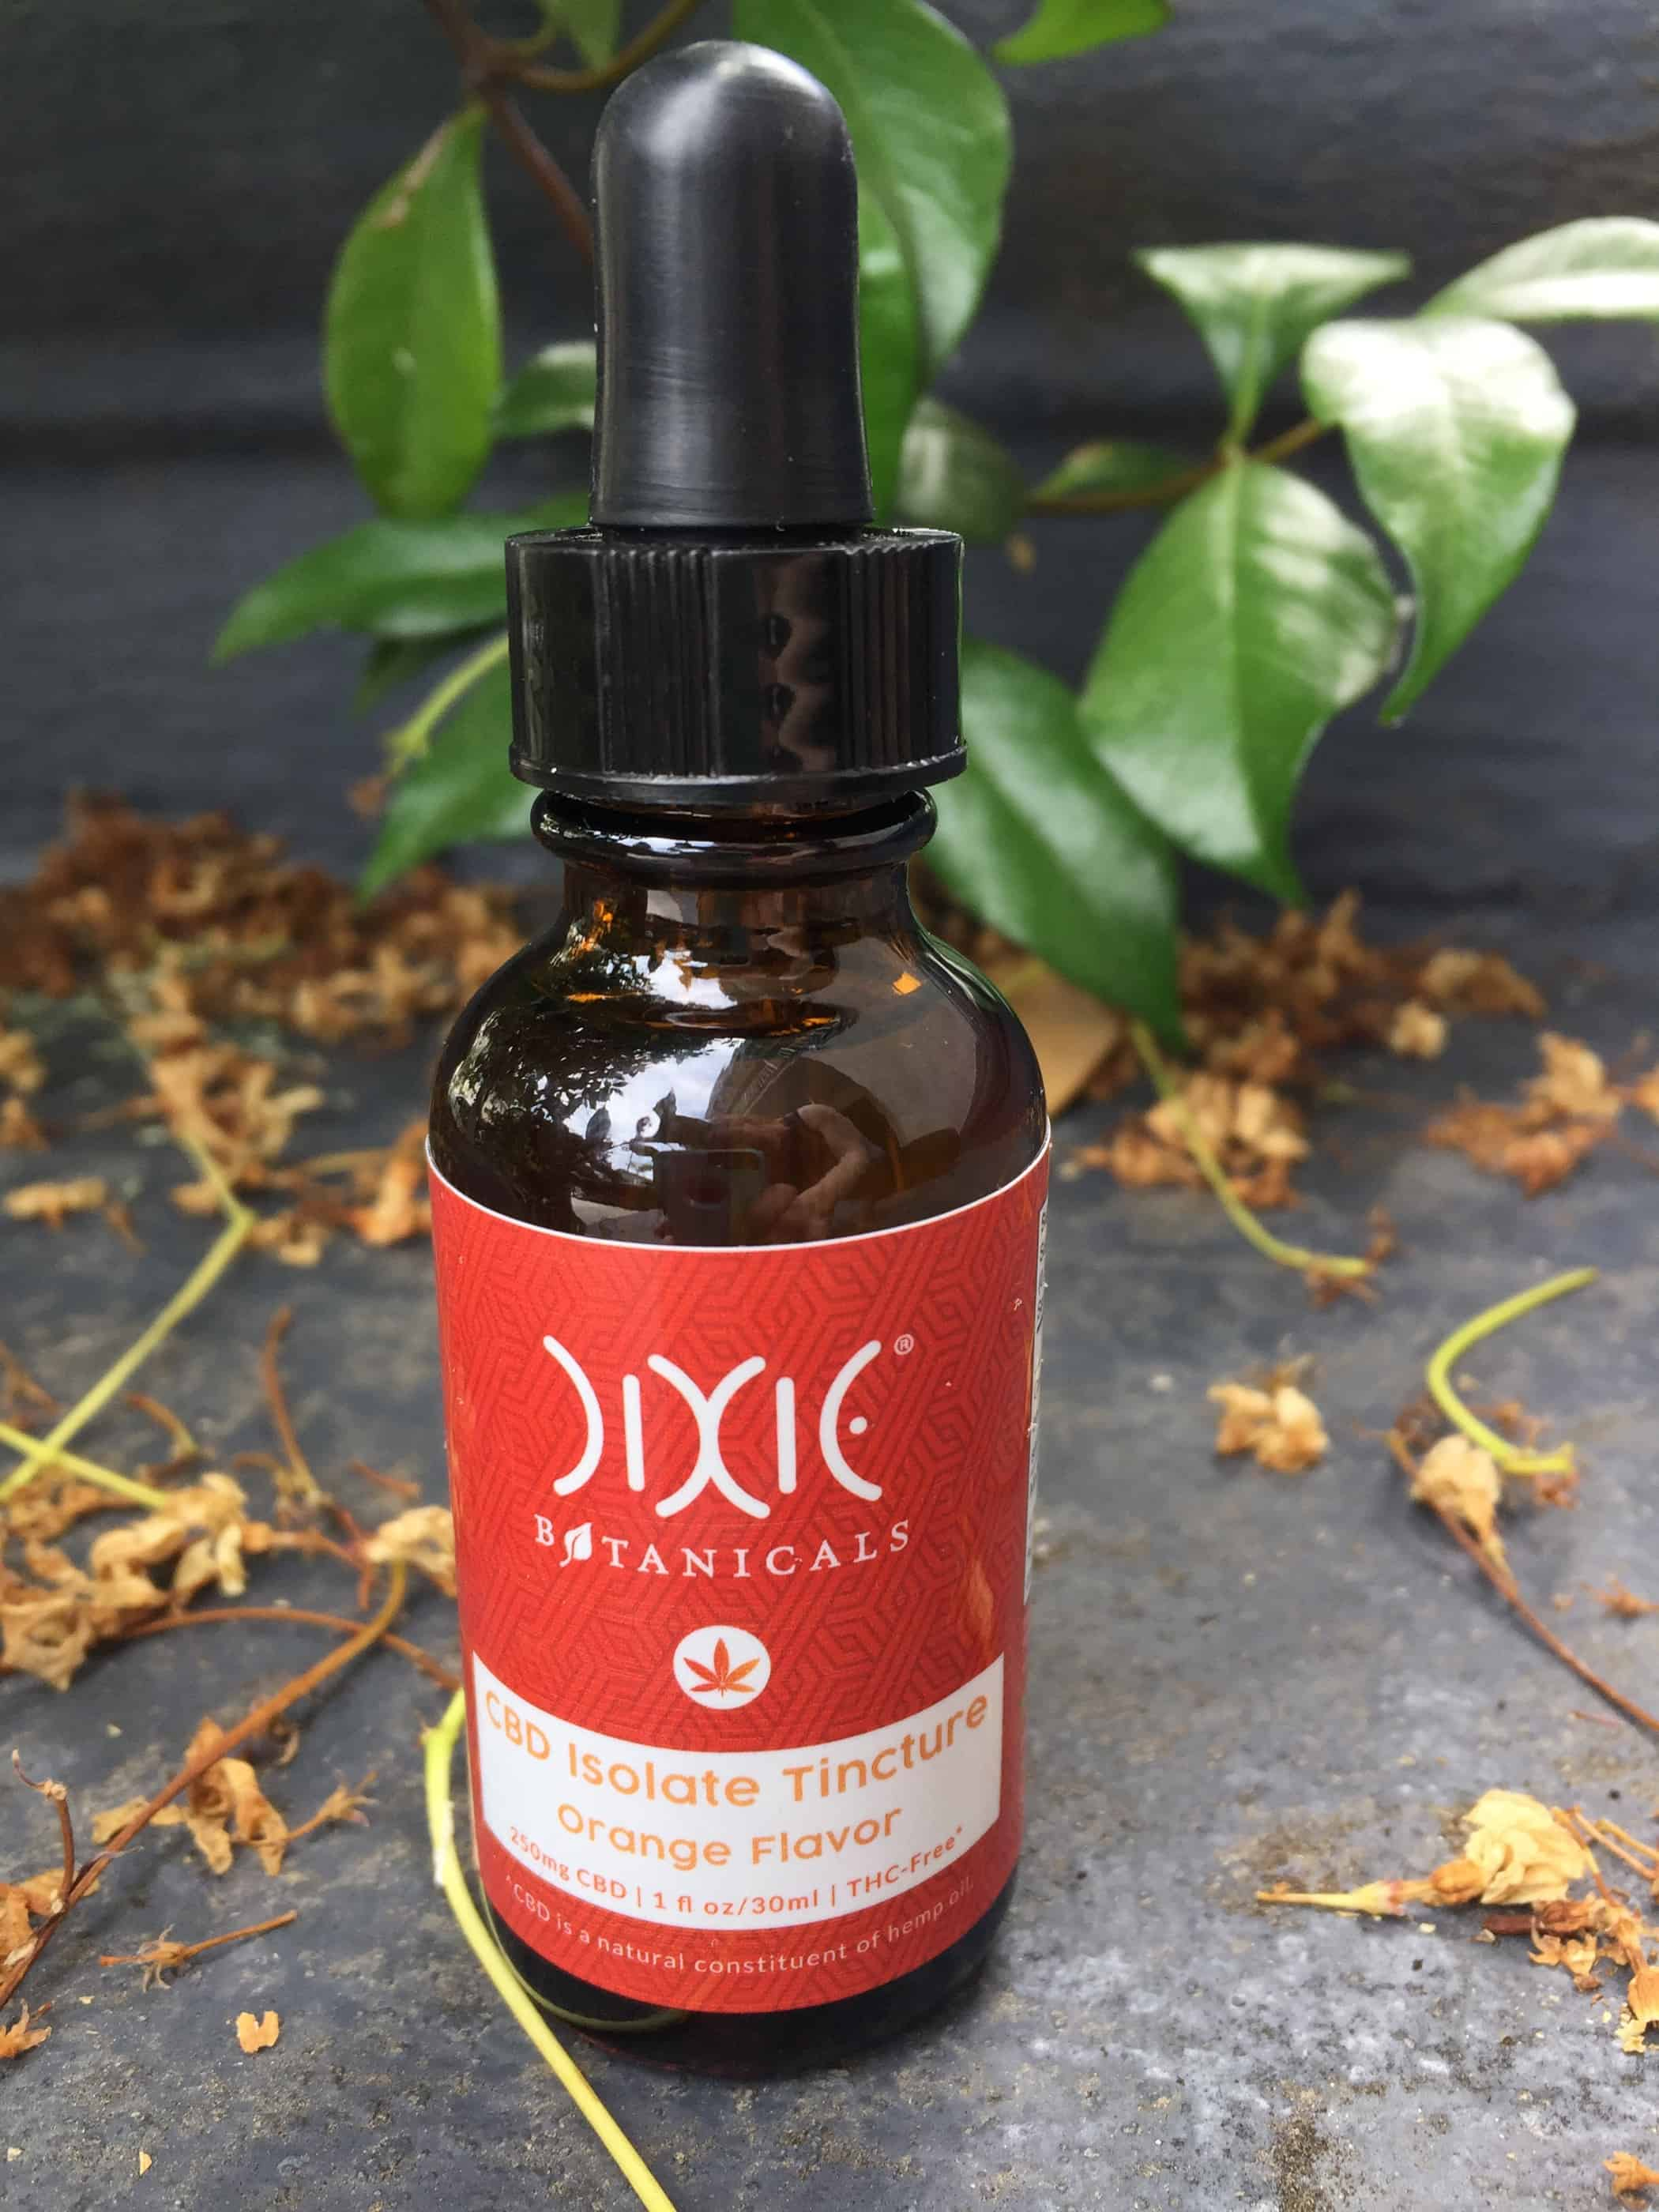 dixie botanicals orange cbd isolate tincture 250 mg save on cannabis review